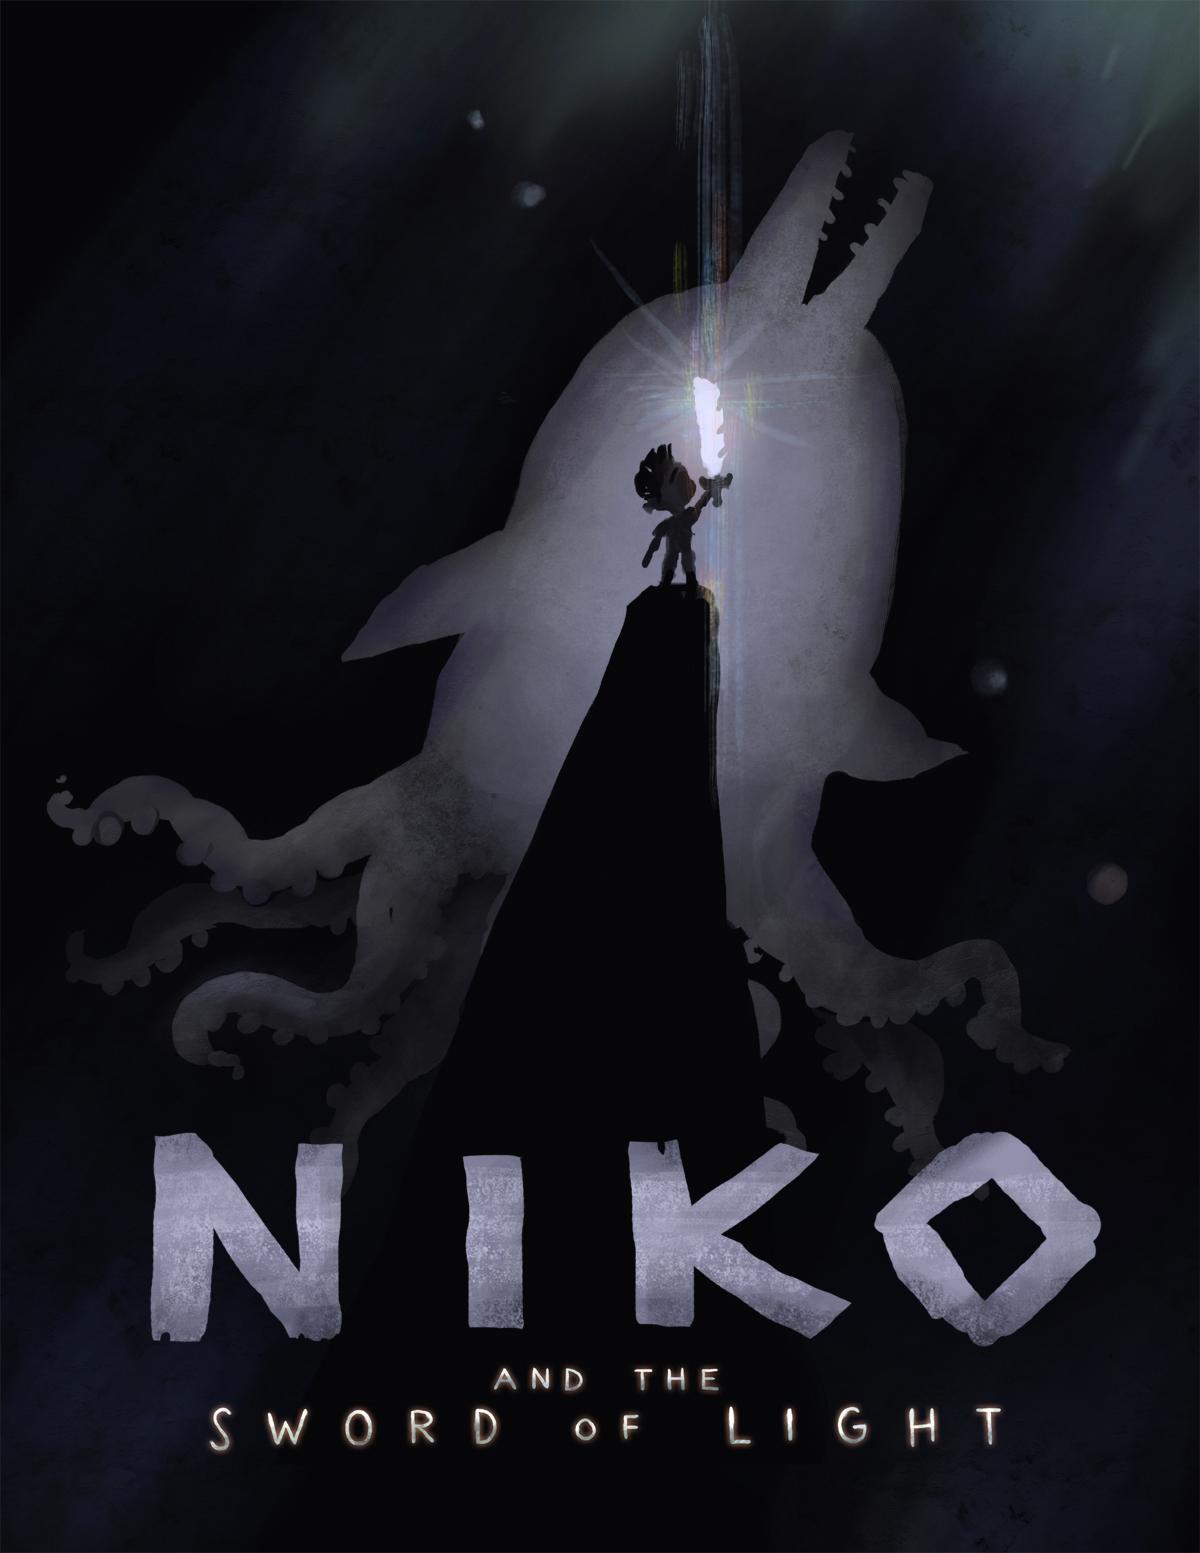 Niko.and.the.Sword.of.Light.S01.2160p.Amazon.WEBRip.DD5.1.x264-TrollUHD